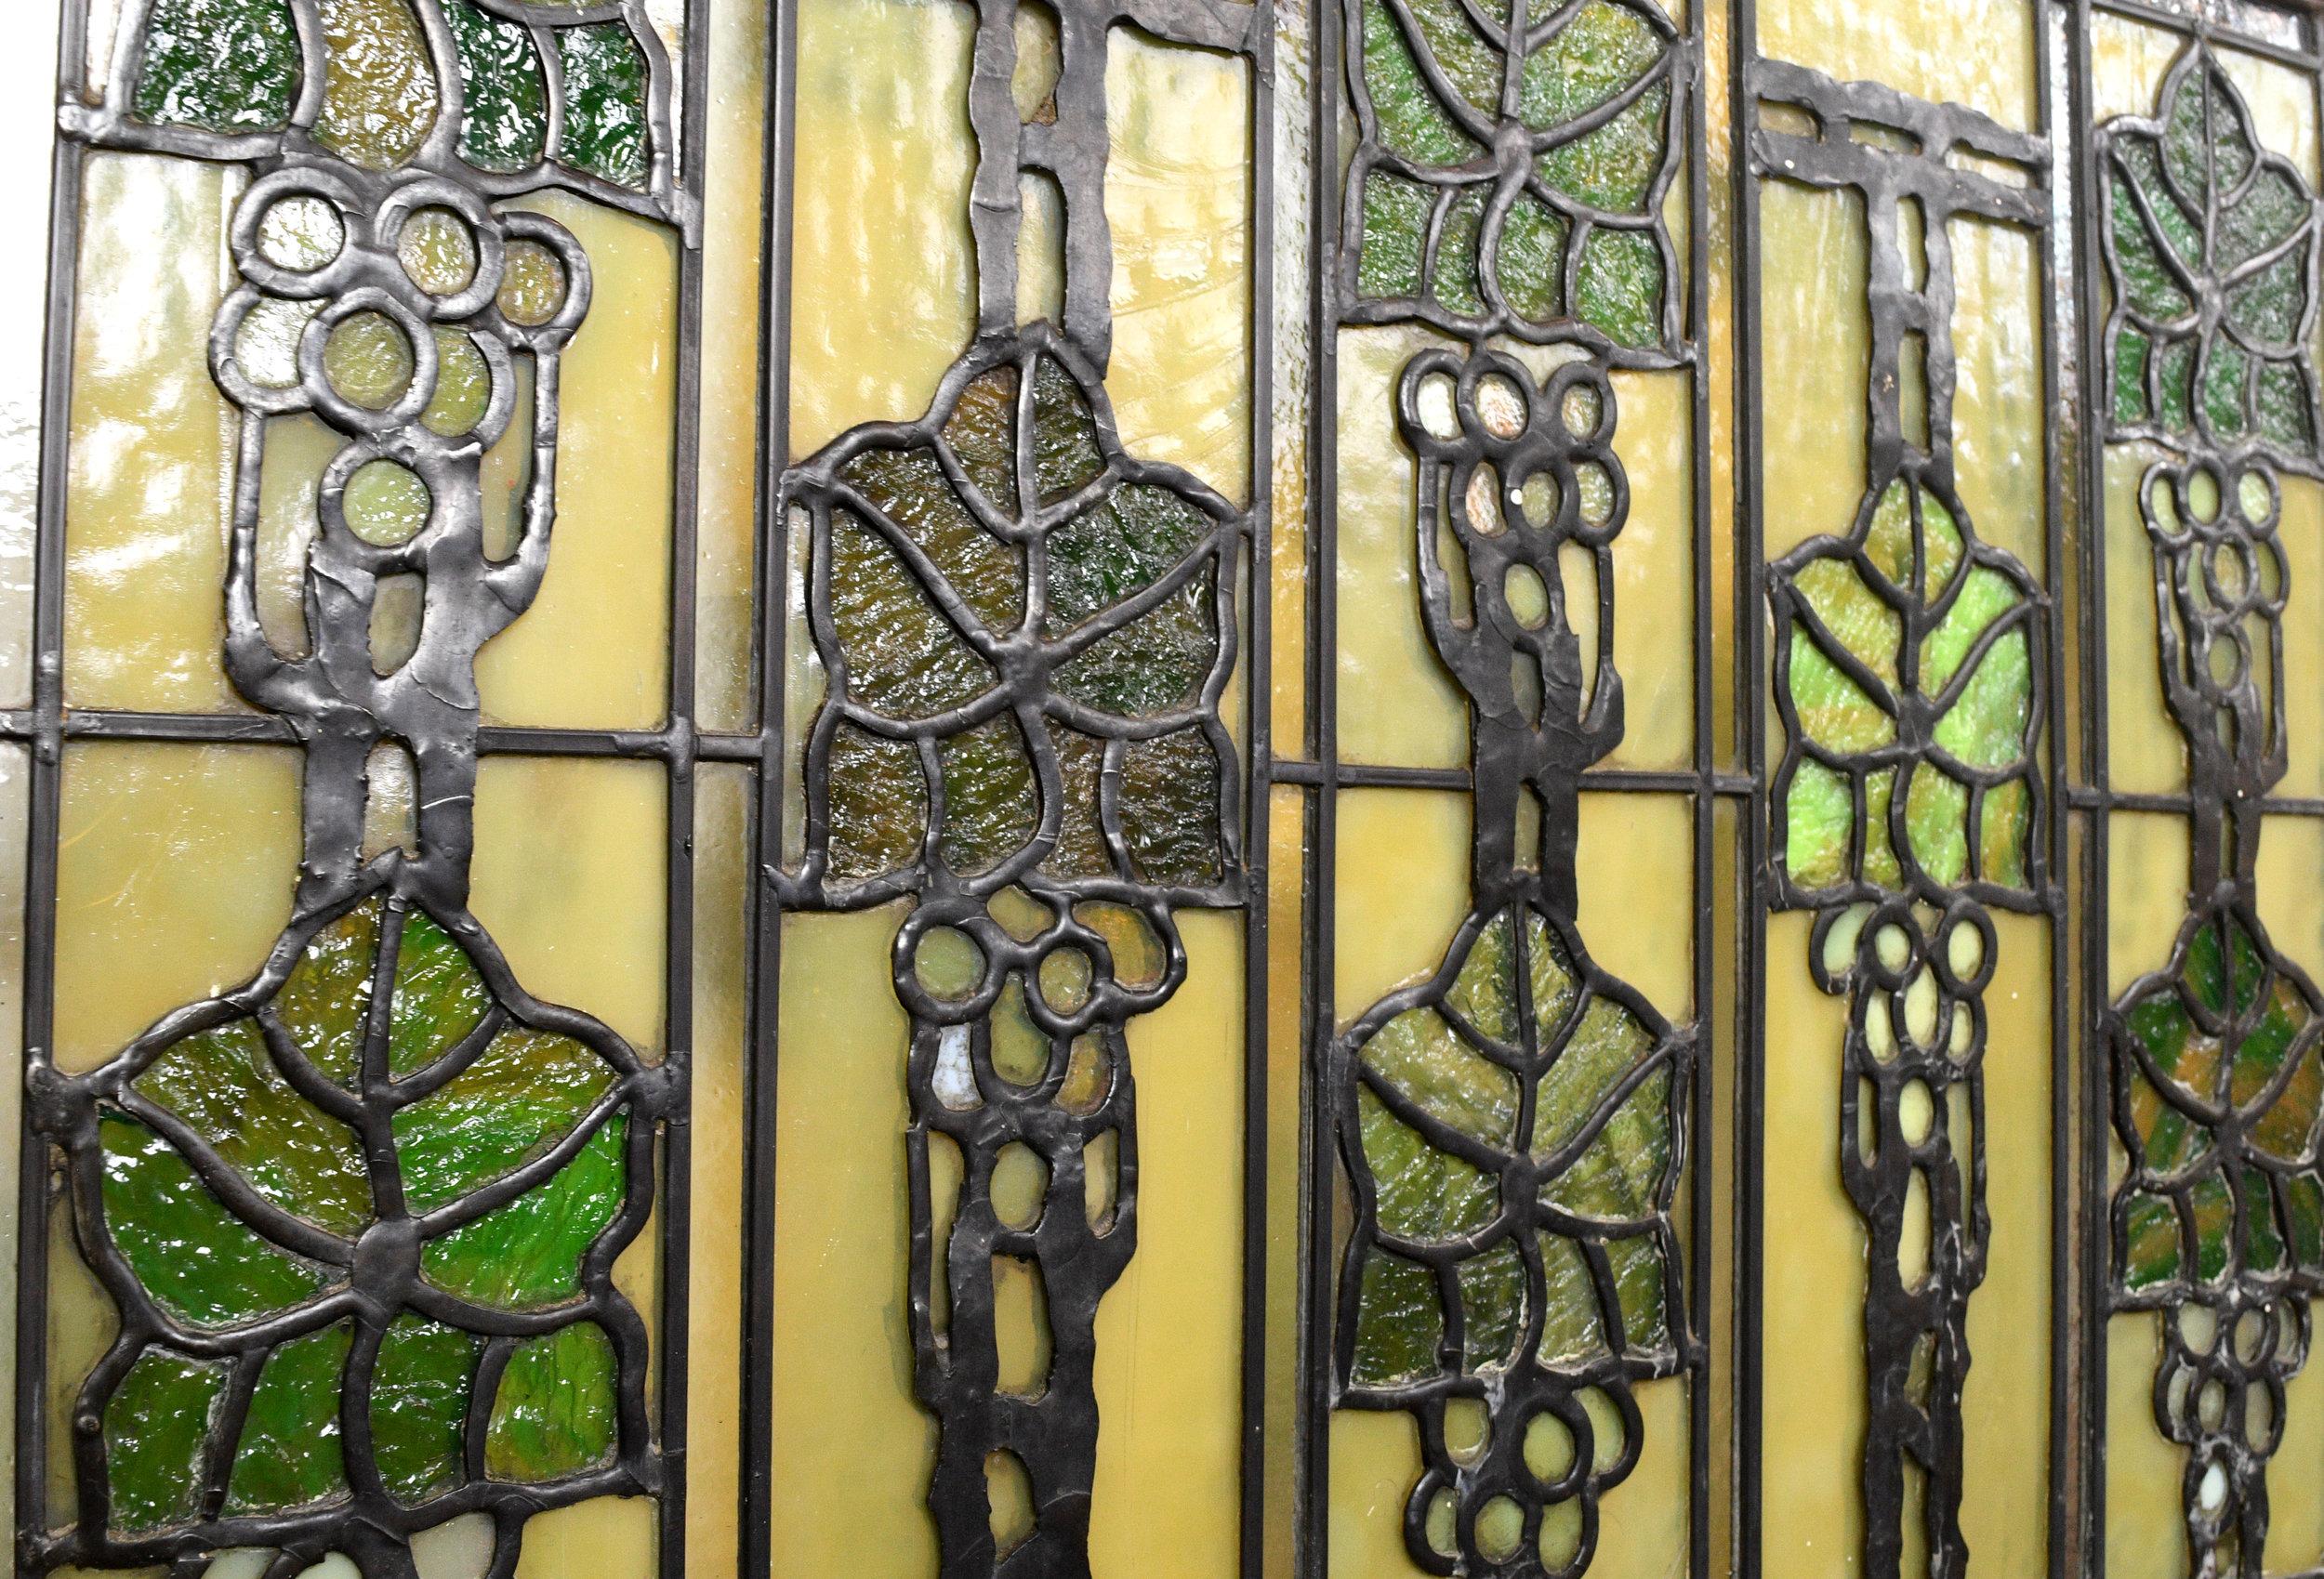 47809-bradstreet-grape-leaves-window-stained-glass-detail.jpg